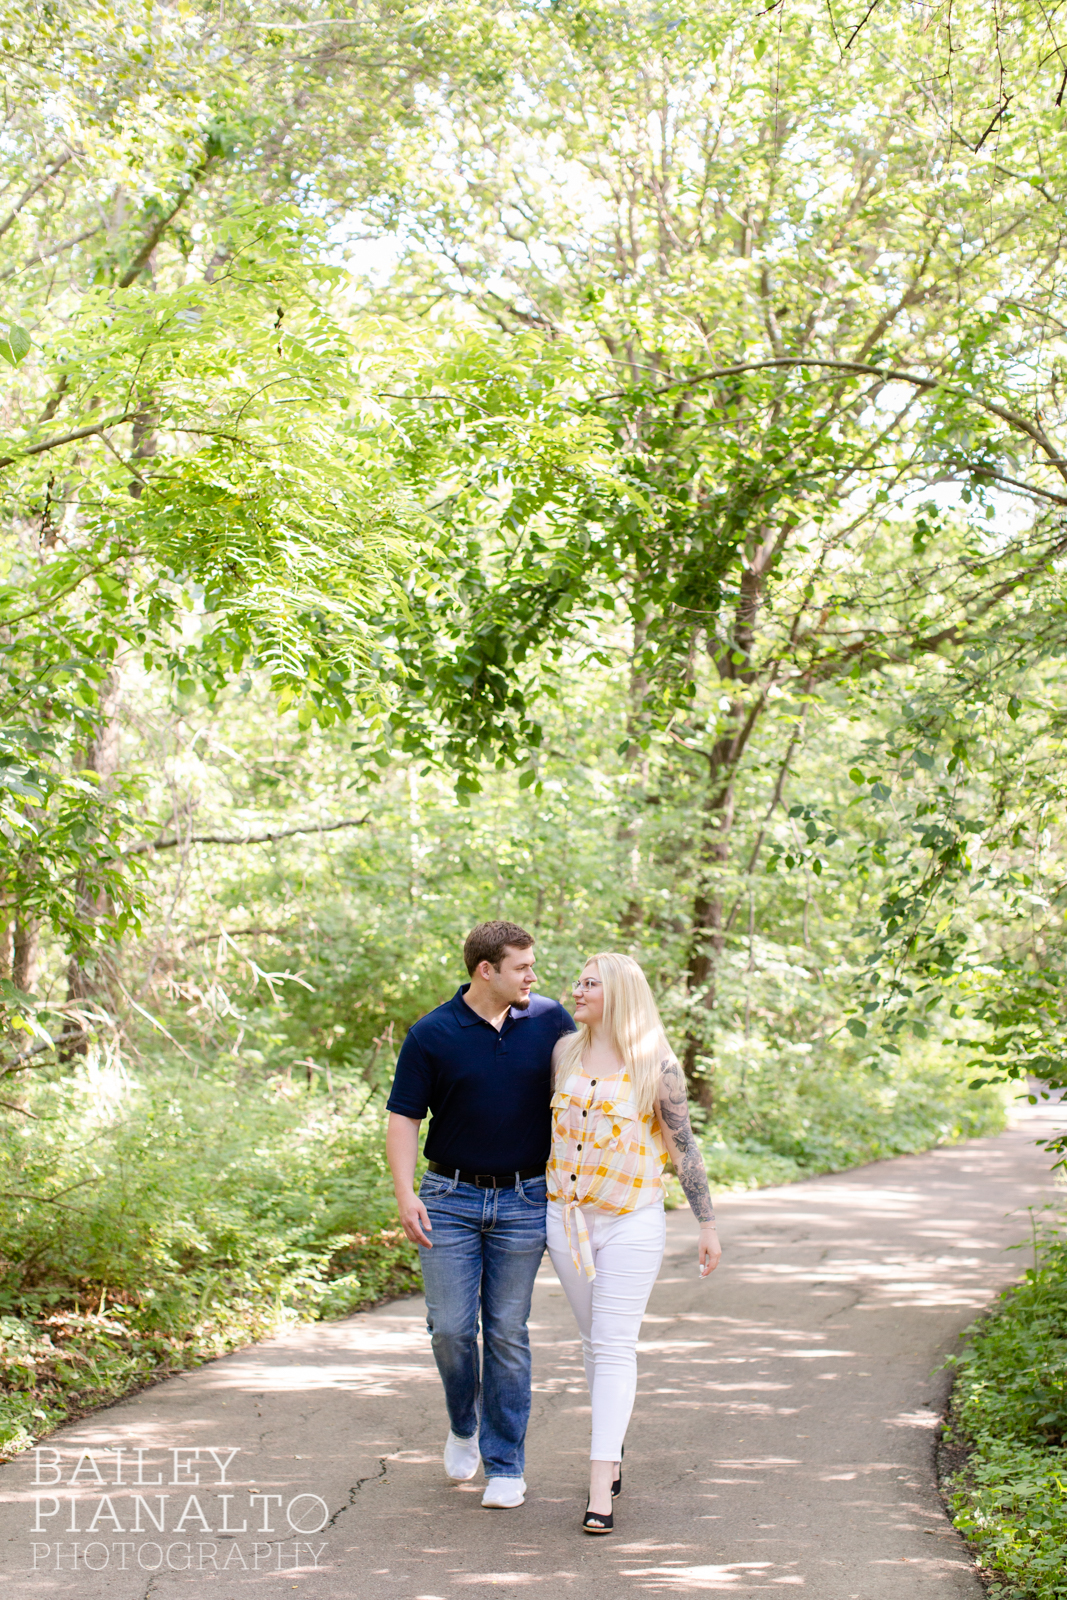 Yellow & Navy Summer Garden Engagement Session Inspiration at the Overland Park Botanical Garden | Kansas City, MO